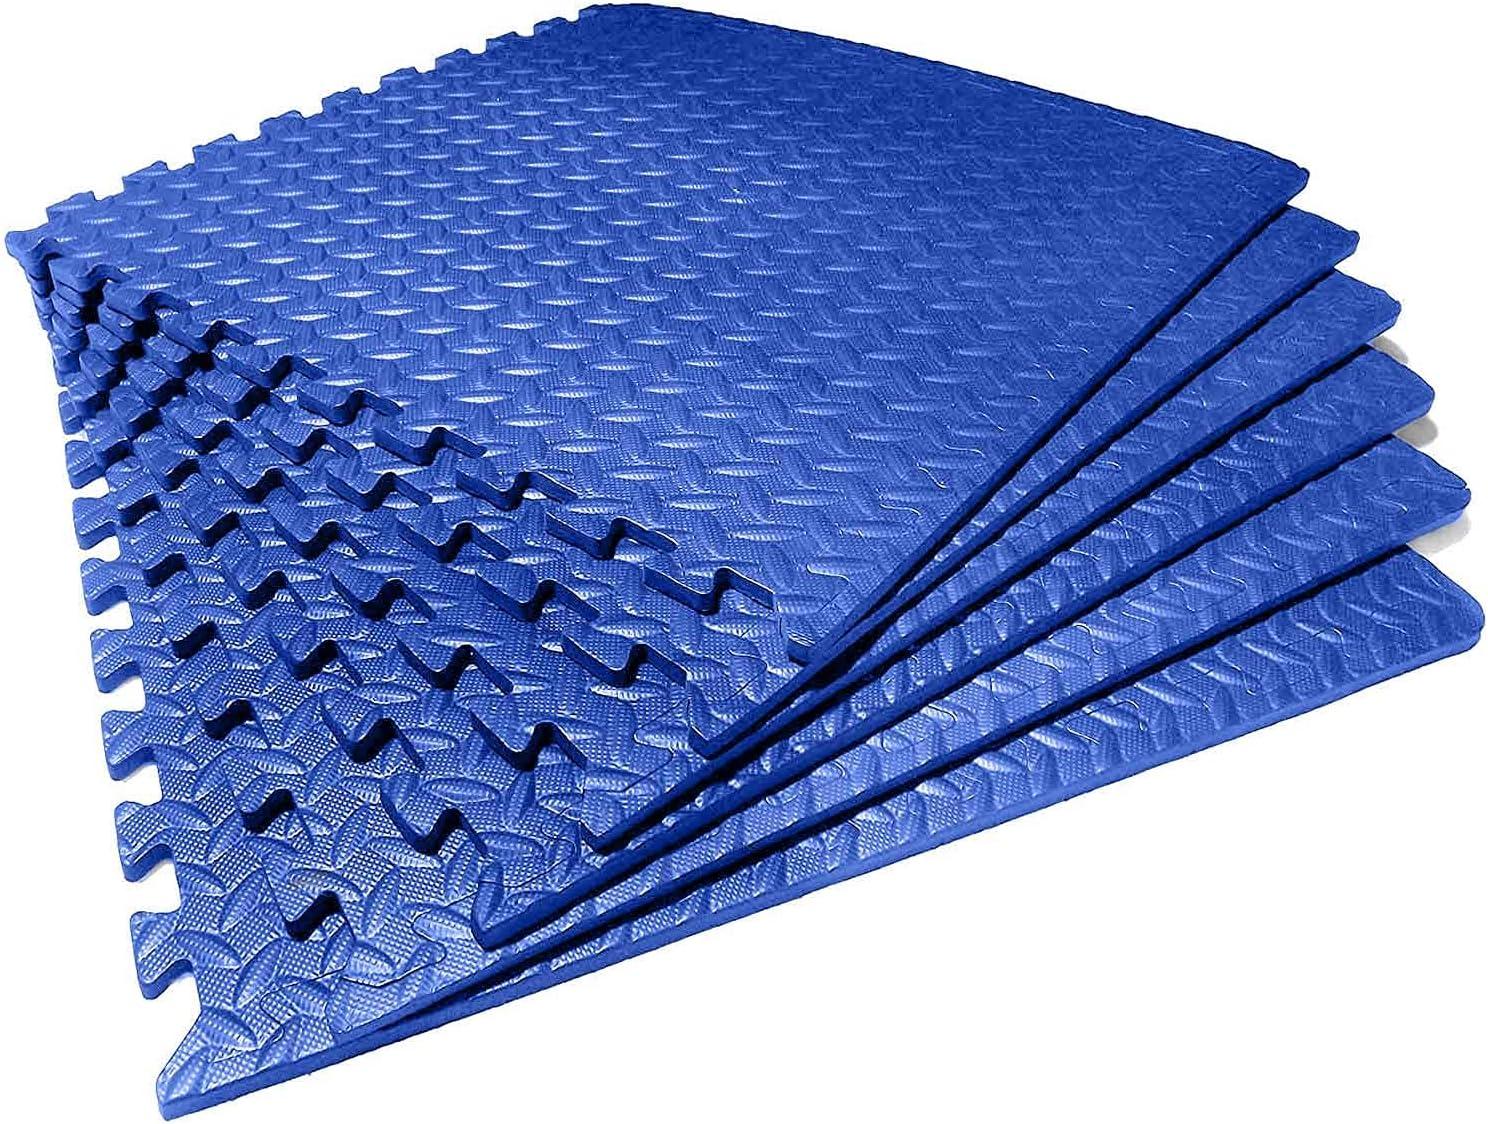 gift XQKXHZ Foam Exercise Mats Gym Mat Sale Puzzle Interlocking Flooring